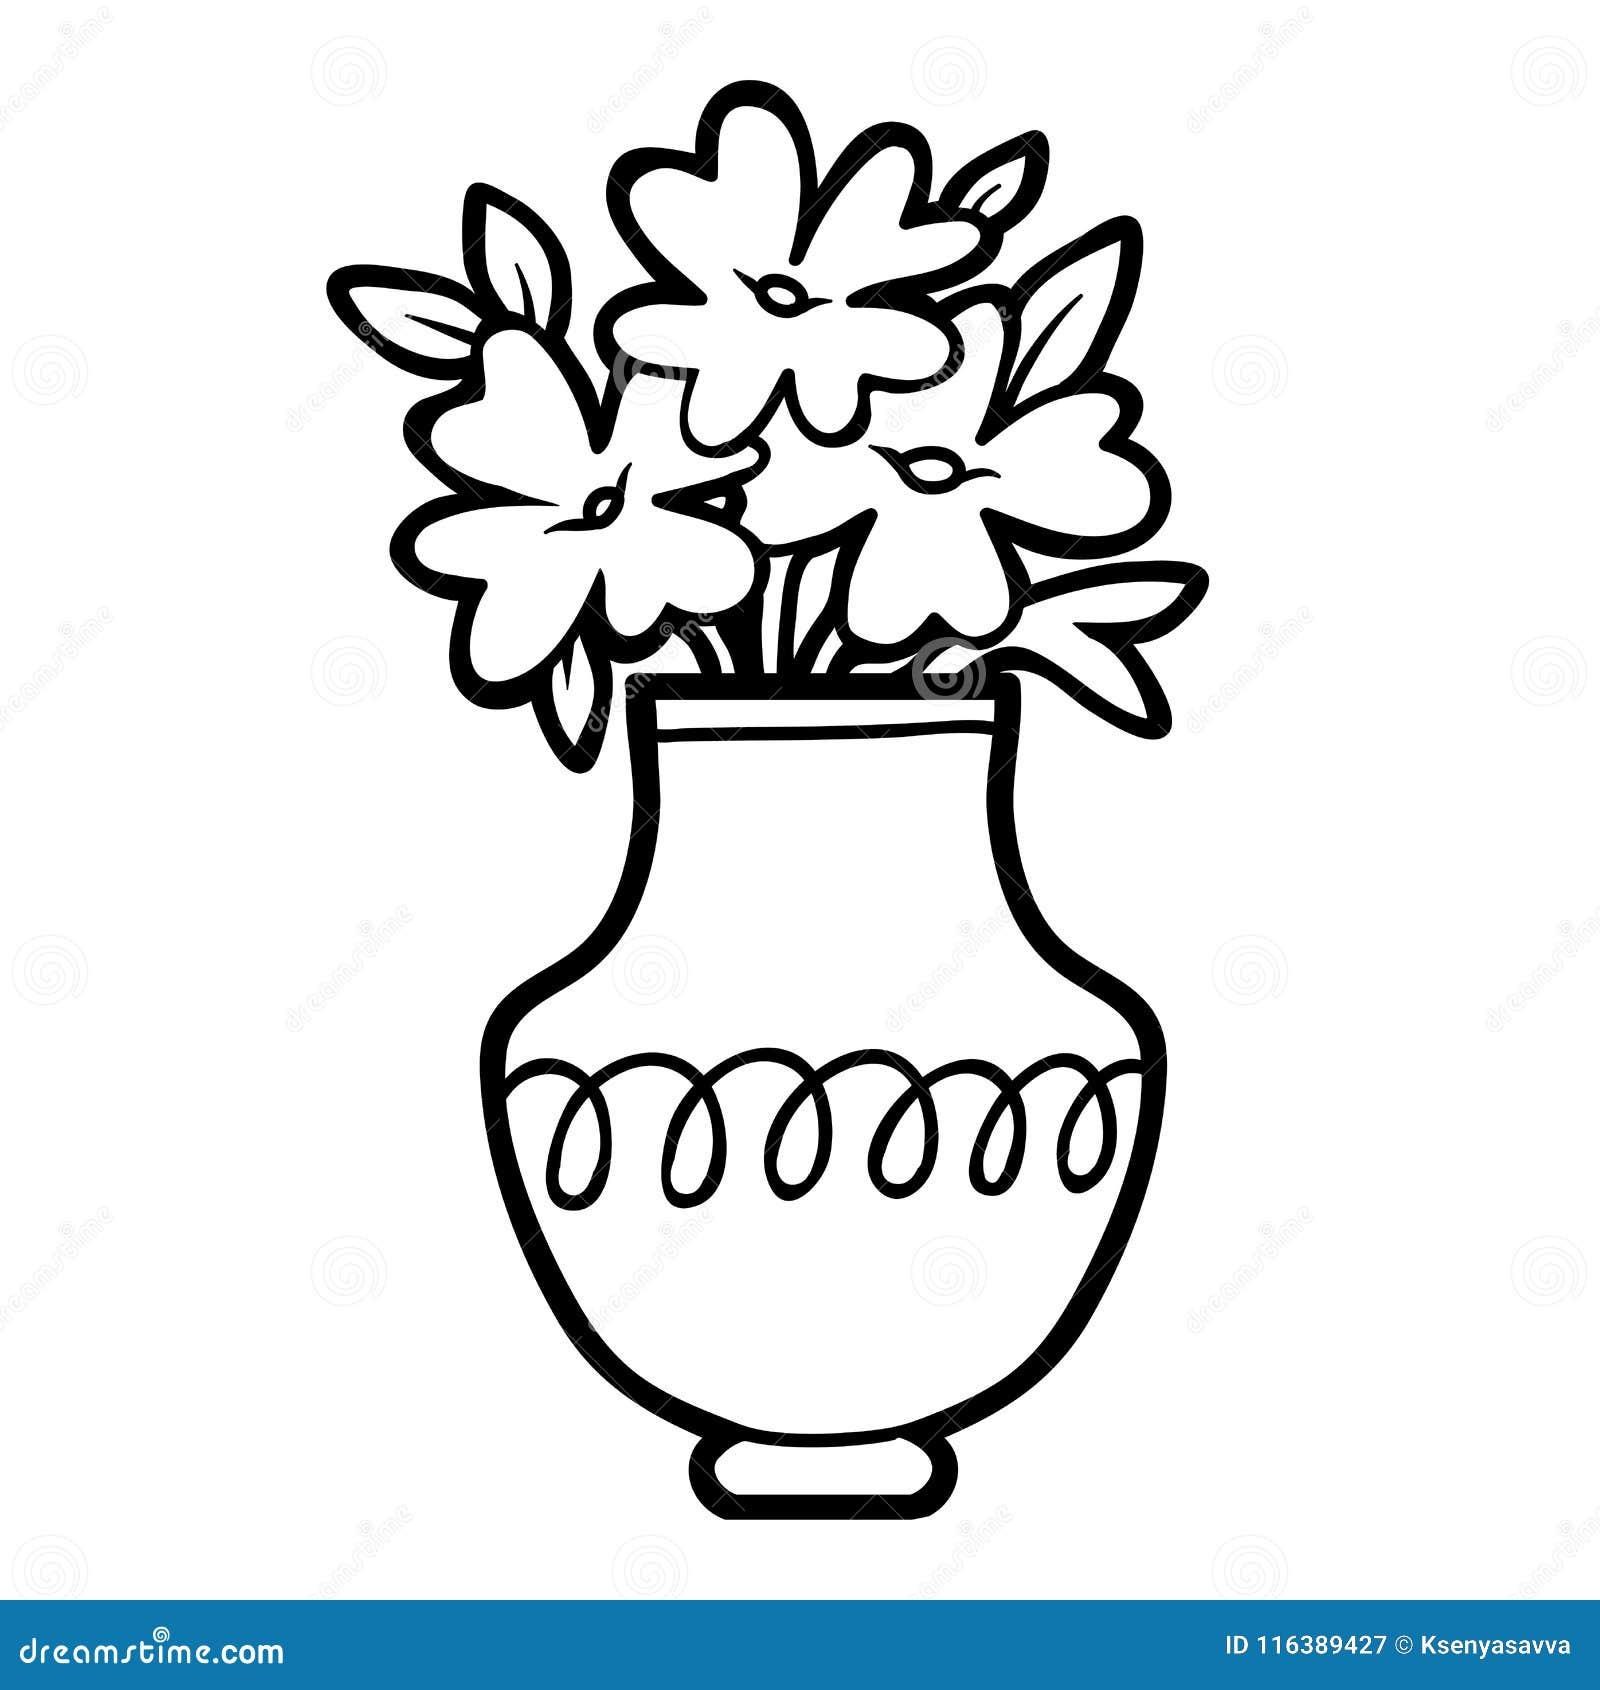 Download Coloring Book Vase Stock Vector Illustration Of Bottle